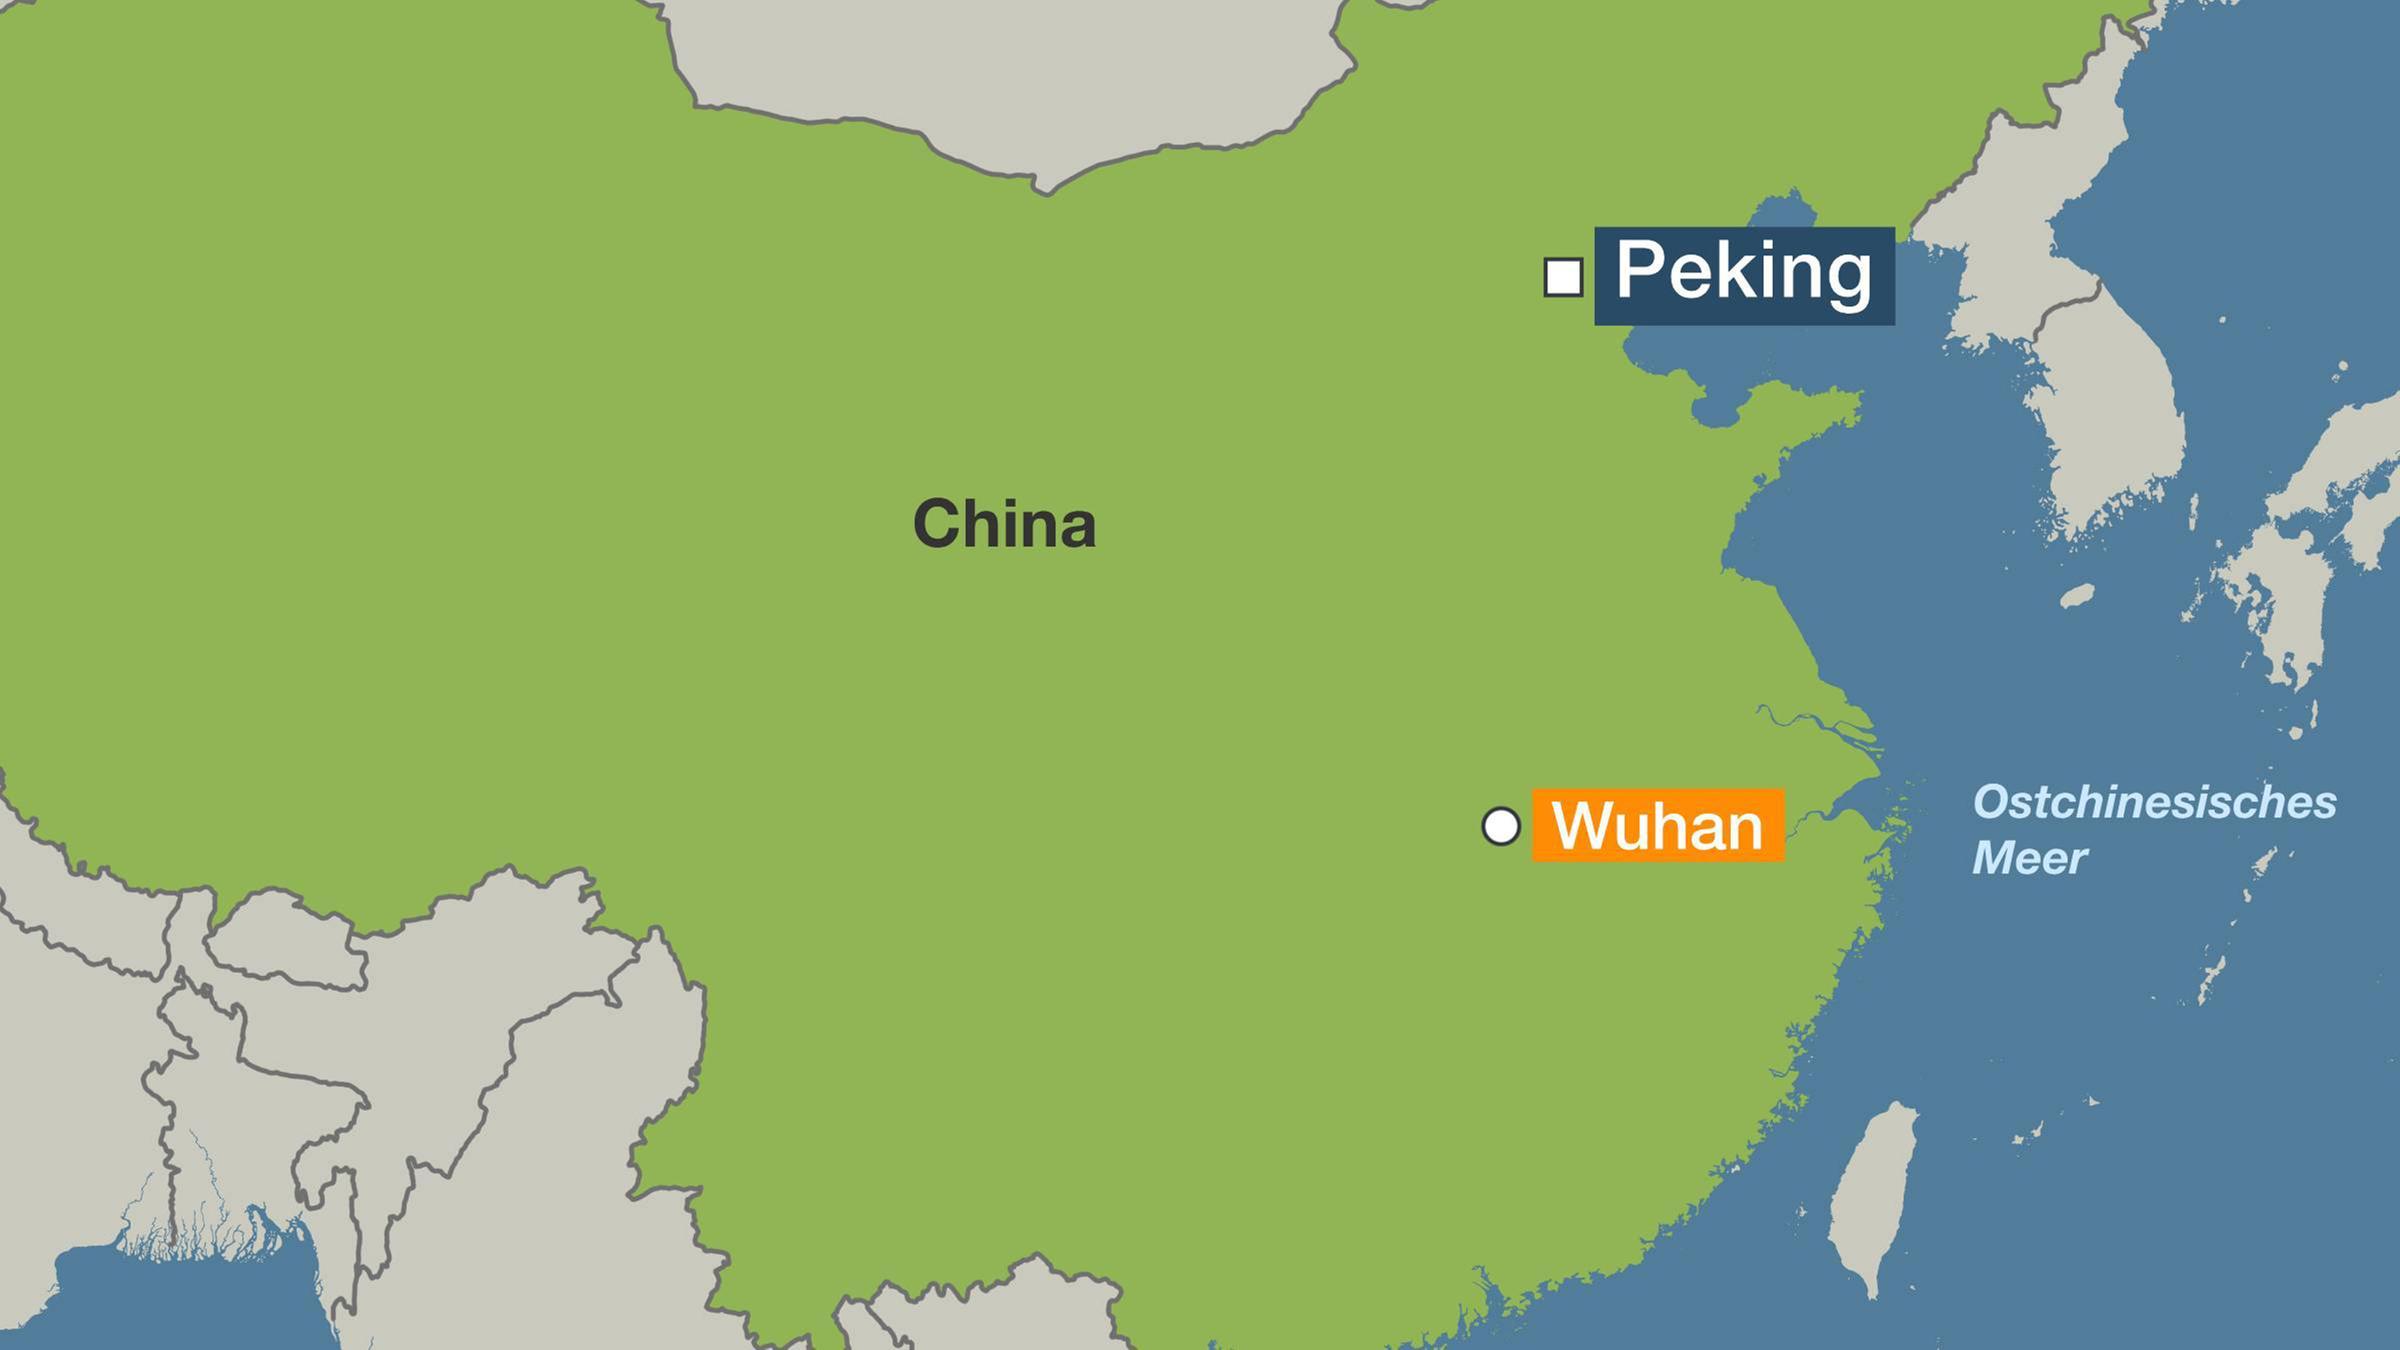 millionenstädte china karte Wuhan, Huanggang, Ezhou: China stellt drei Millionenstädte unter